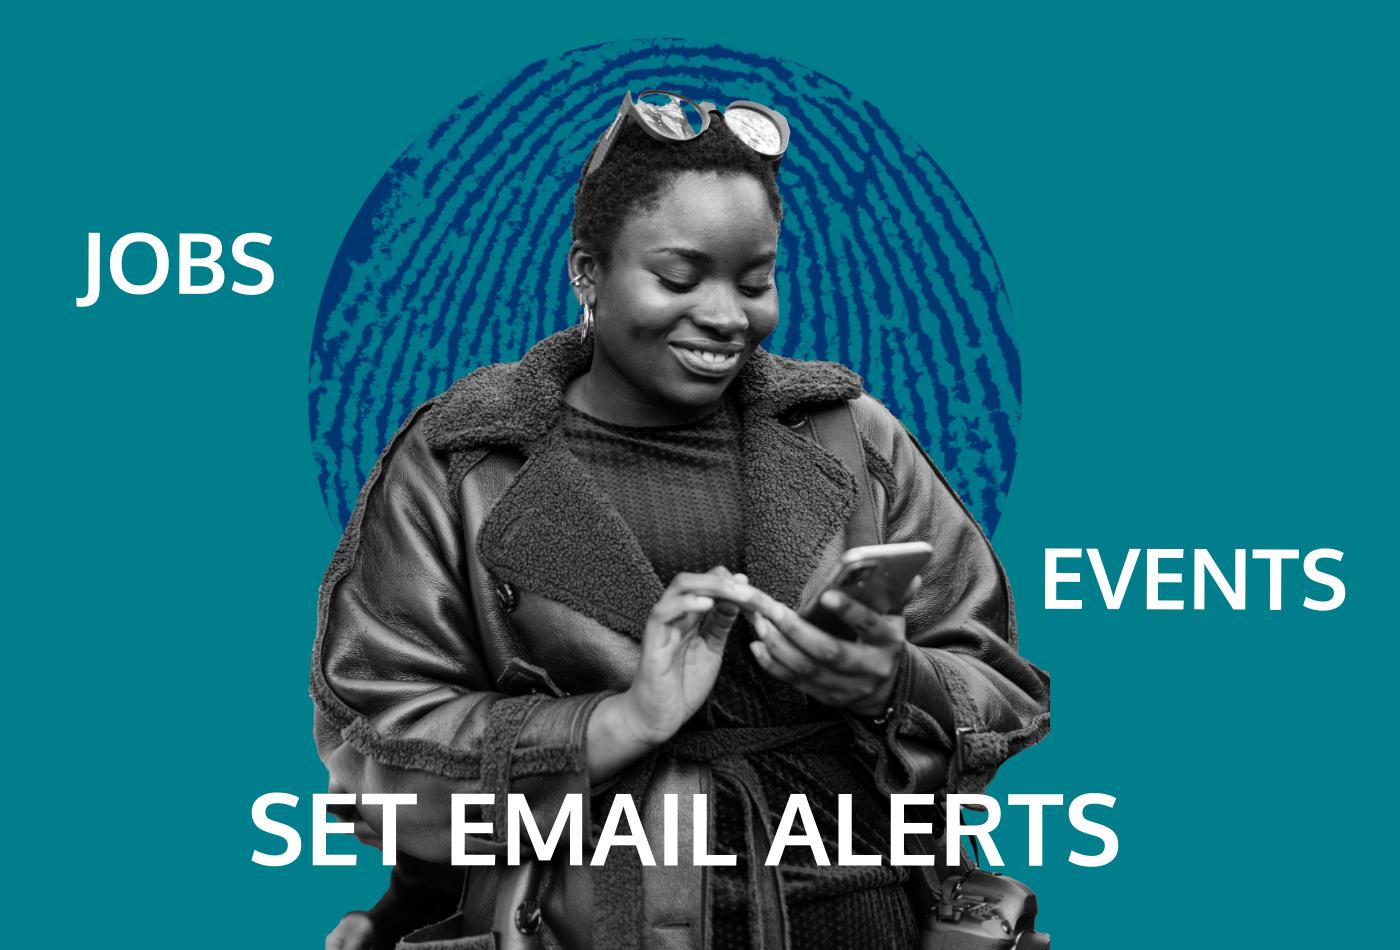 Set job and email alerts